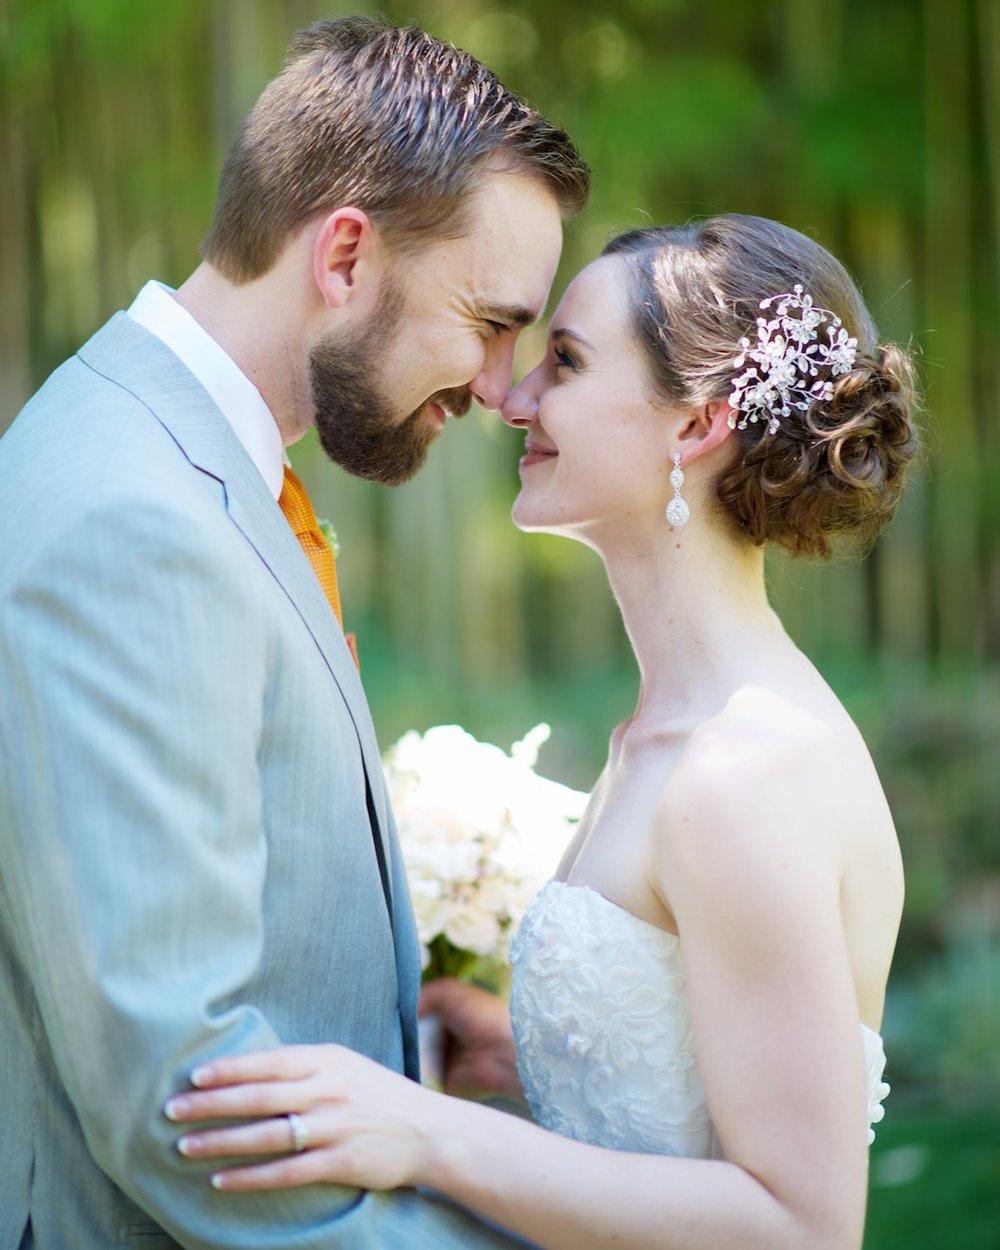 napa-wedding-michal-pfeil-24.jpg